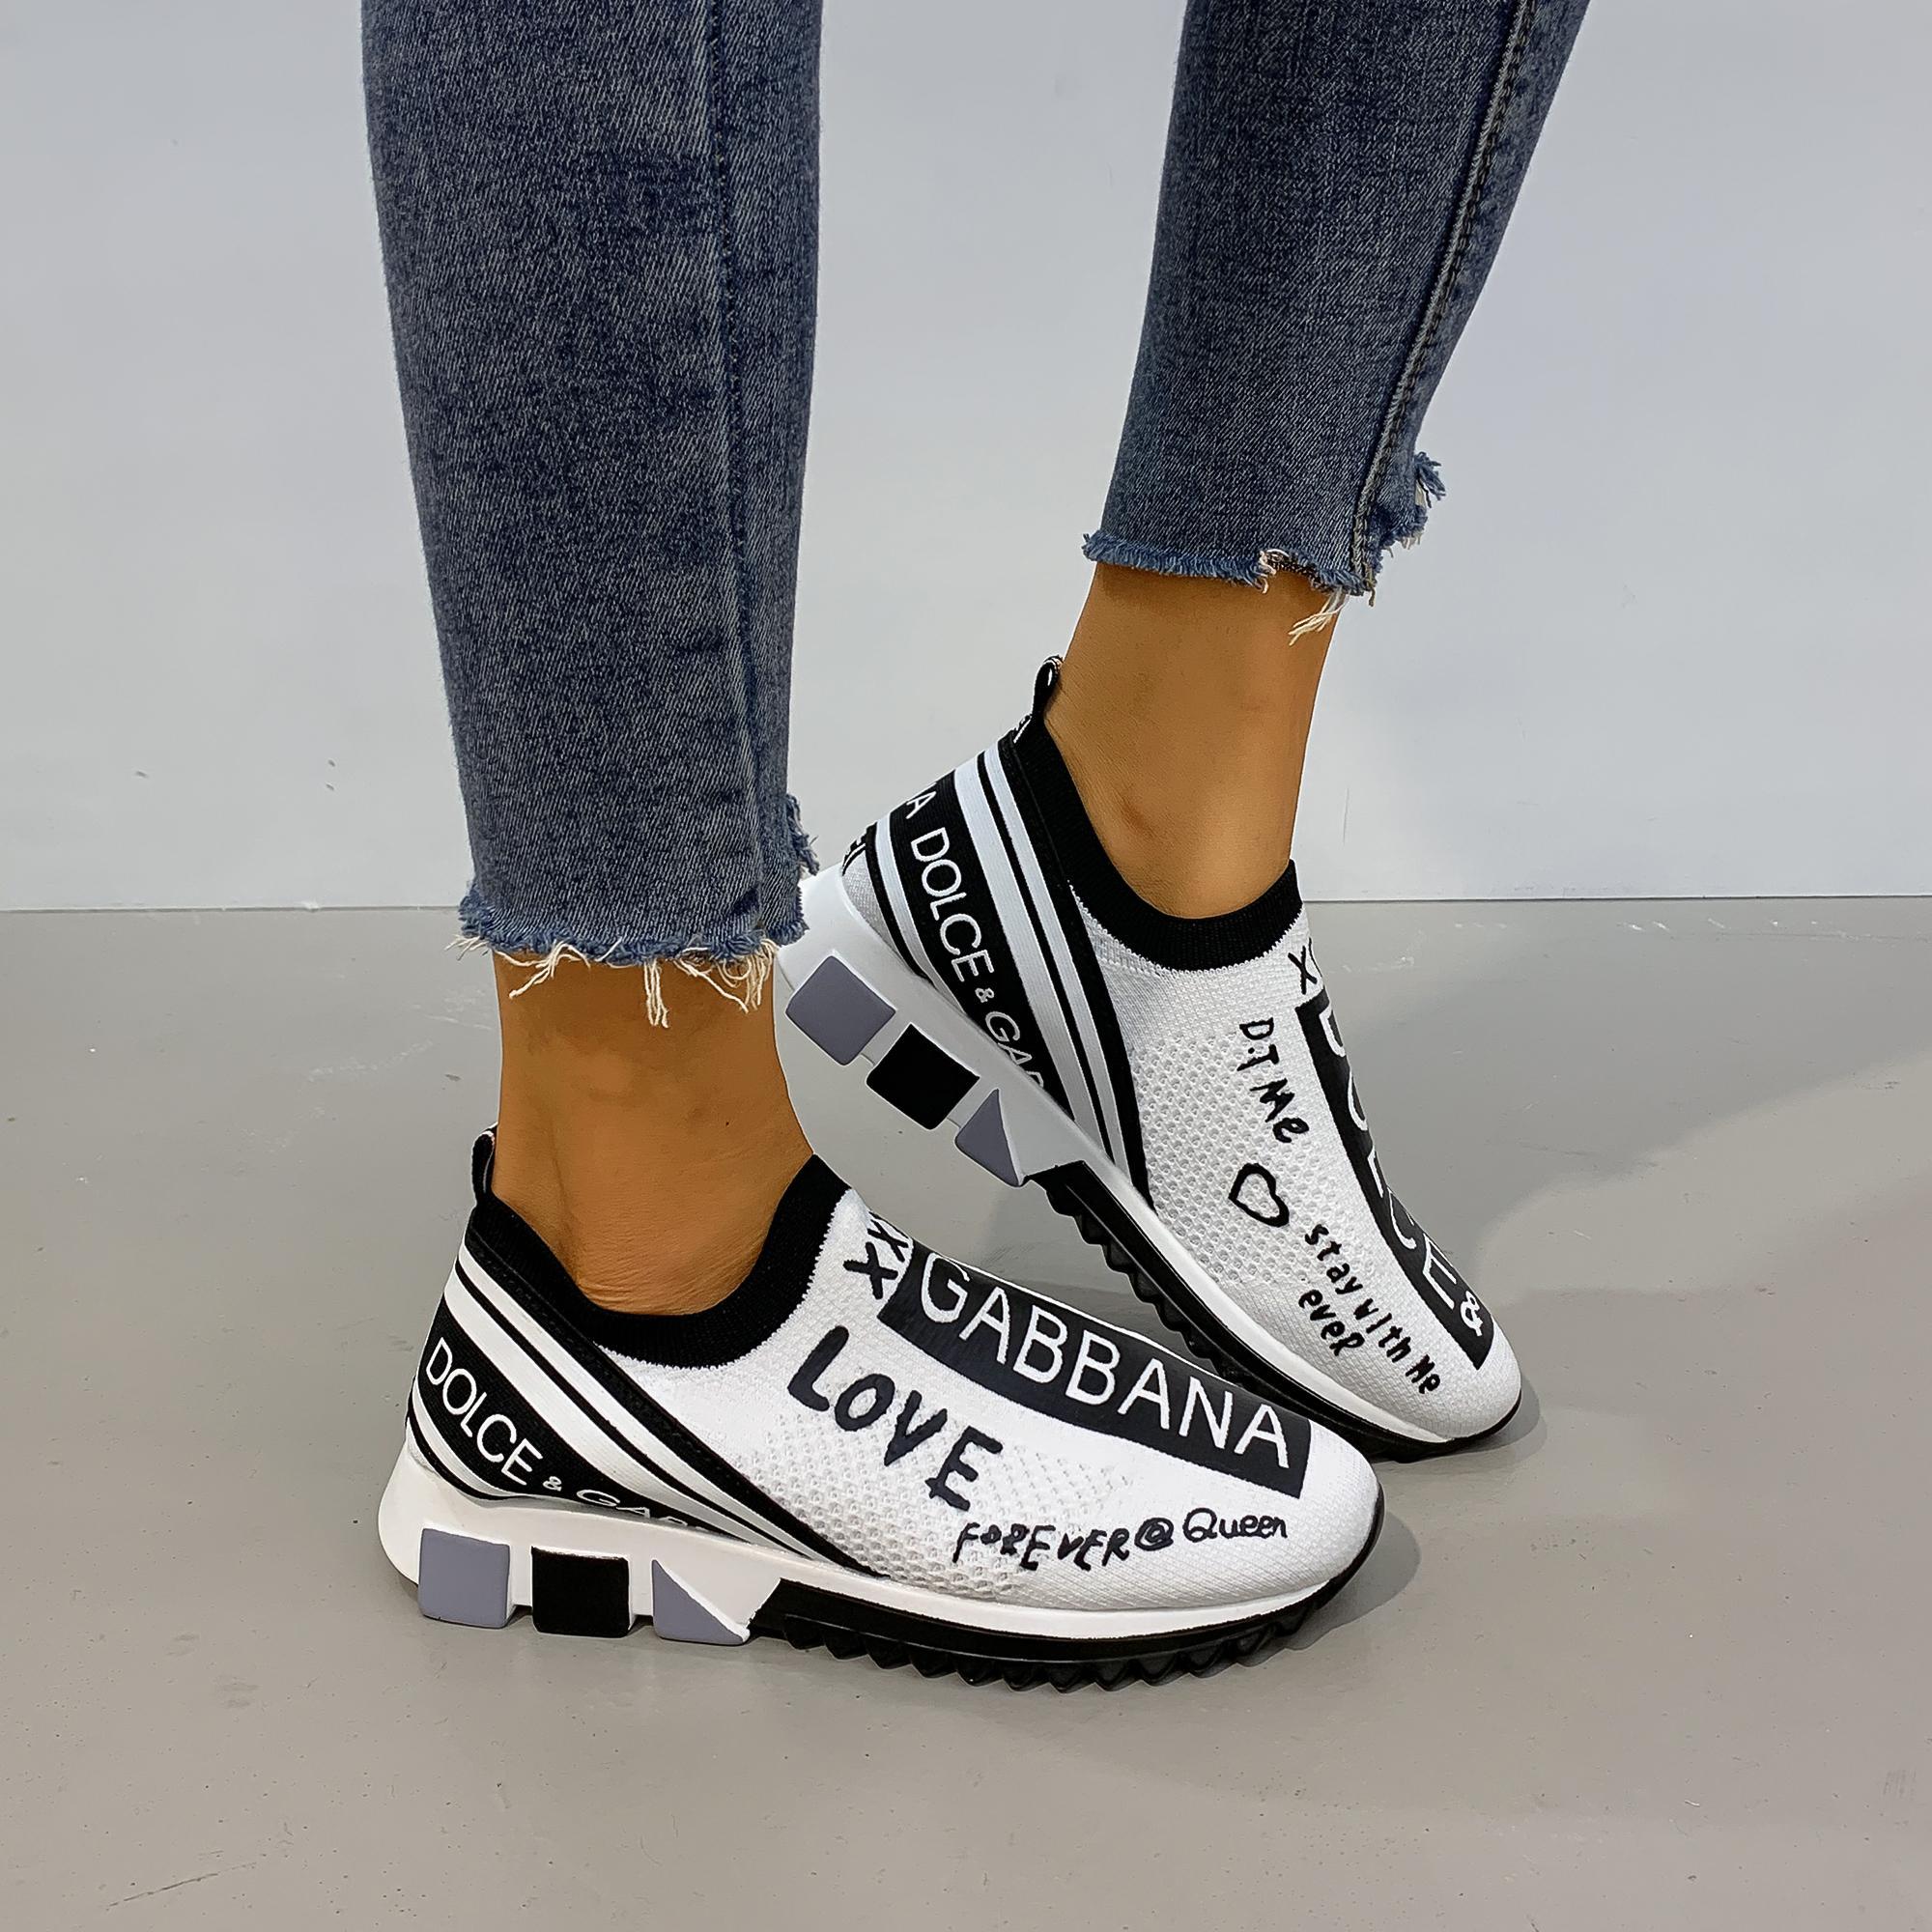 New 2021 DG Mesh Sneakers Women Shoes Black White 2.0 Luxury Sock breathable Sneaker Men